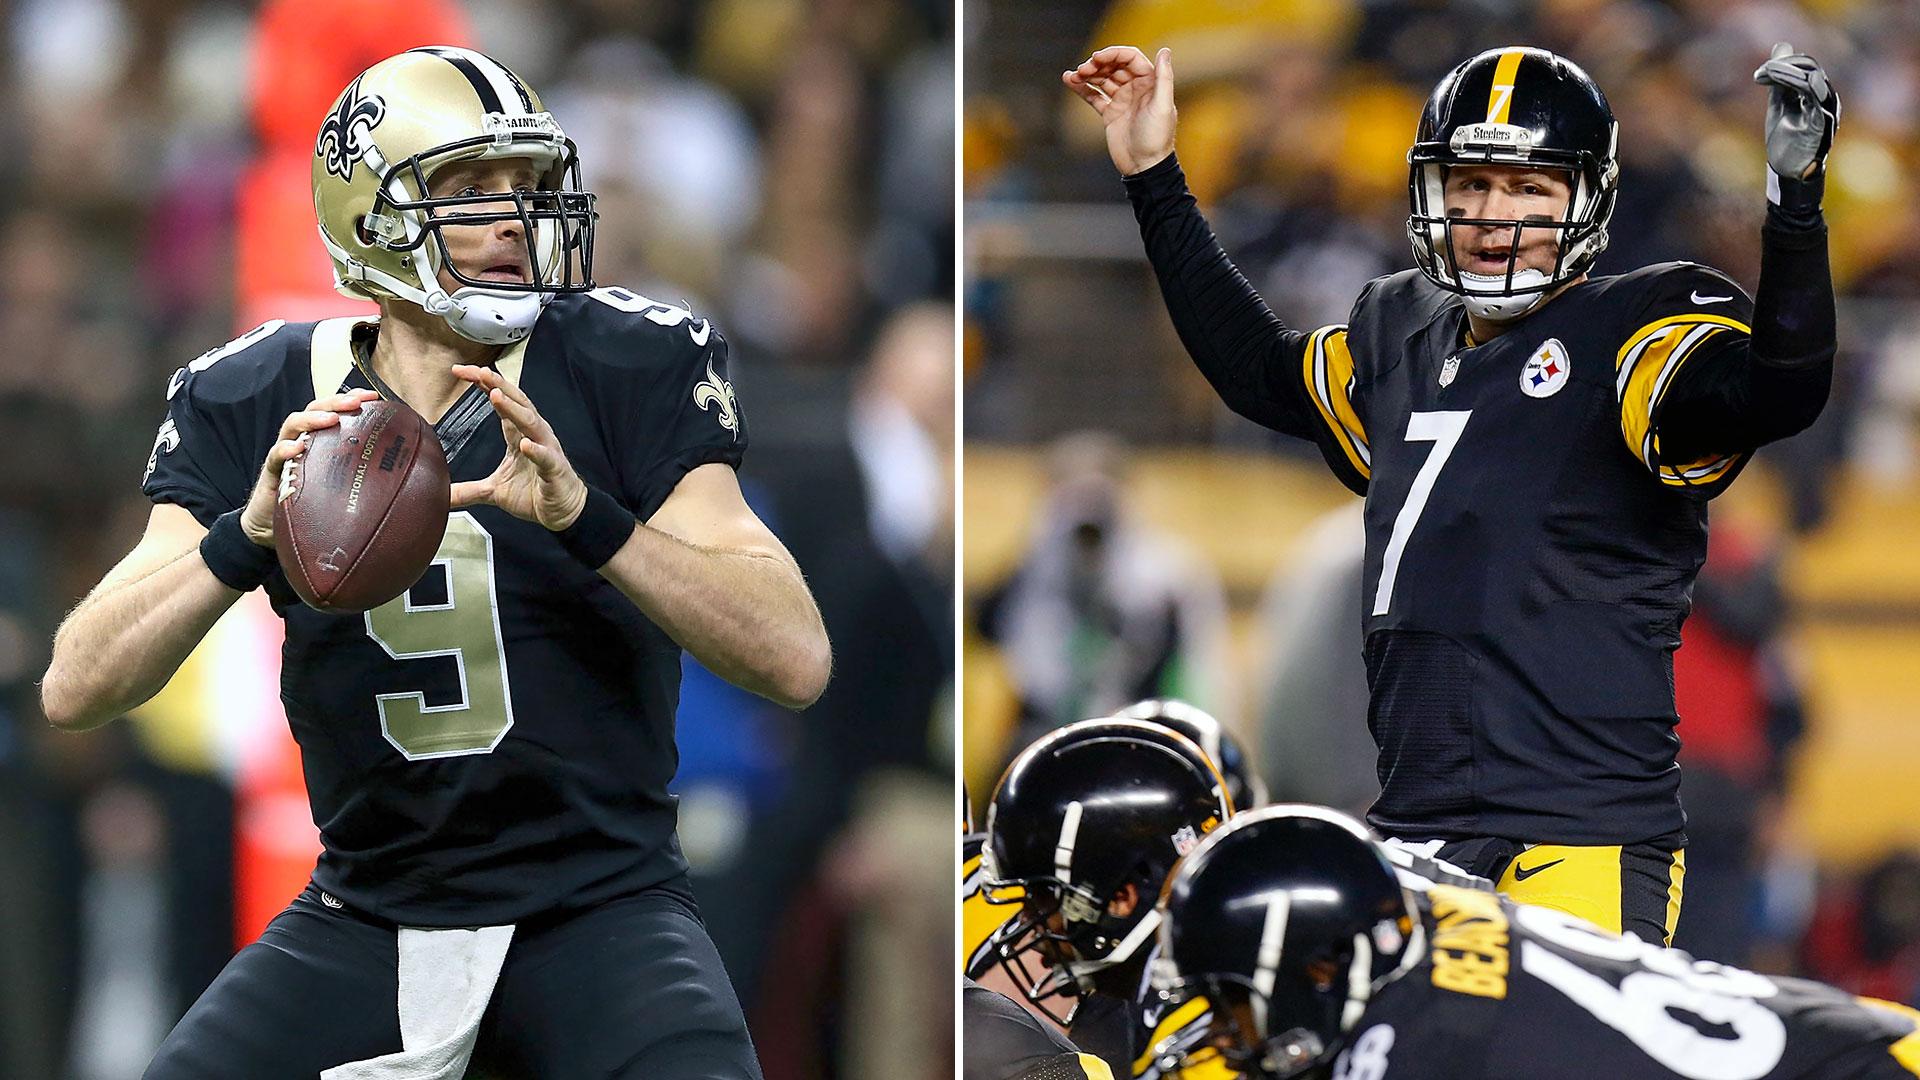 Fantasy Football Draft Decision Drew Brees or Ben Roethlisberger